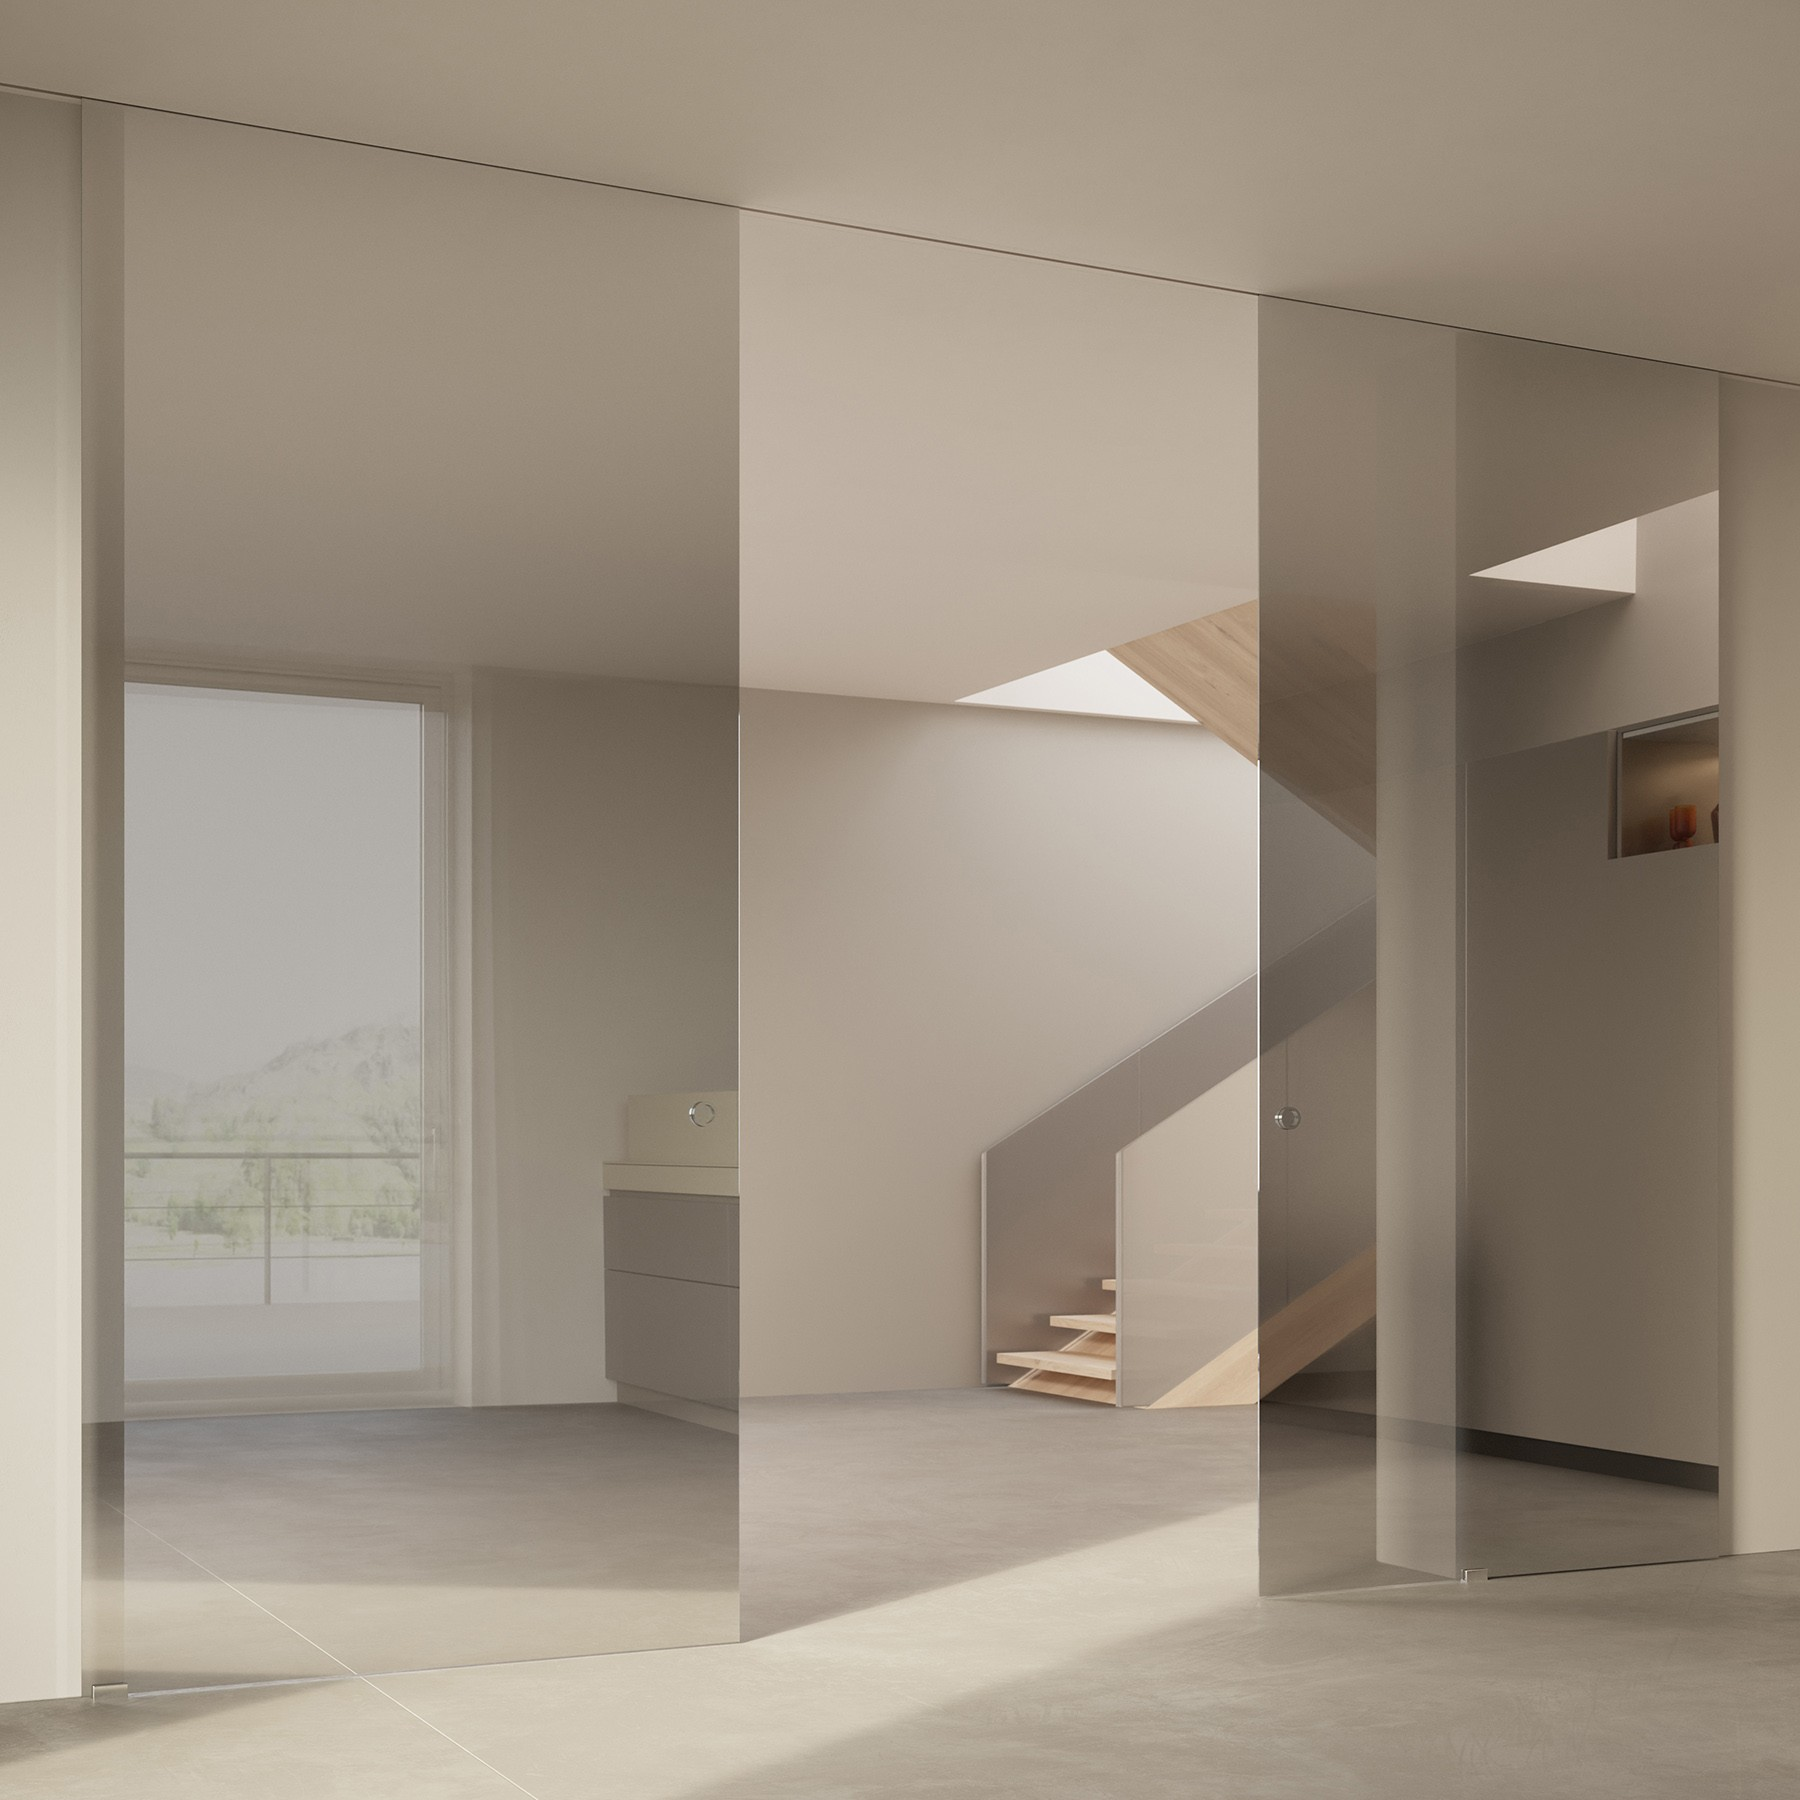 Scenario Visio Up with Reflecting grigio glass